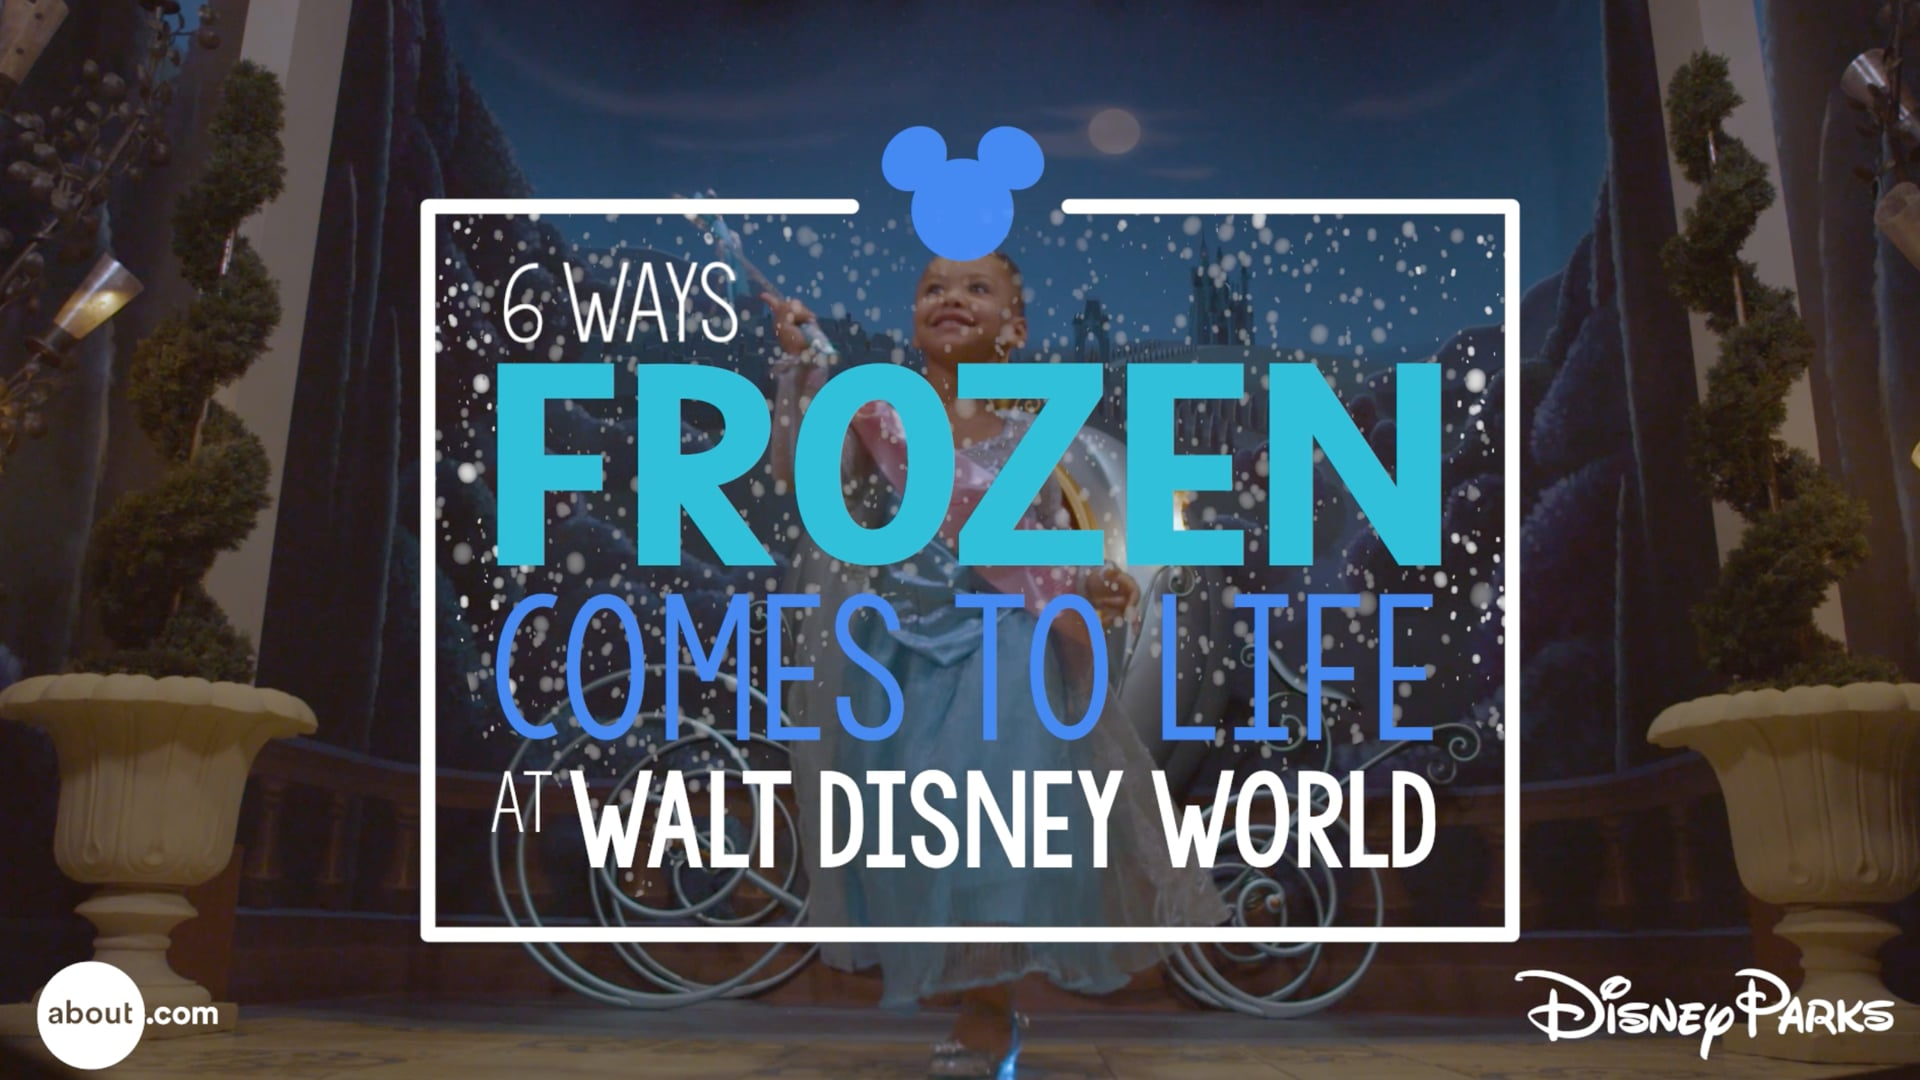 6 Ways Frozen Comes to Life at Walt Disney World